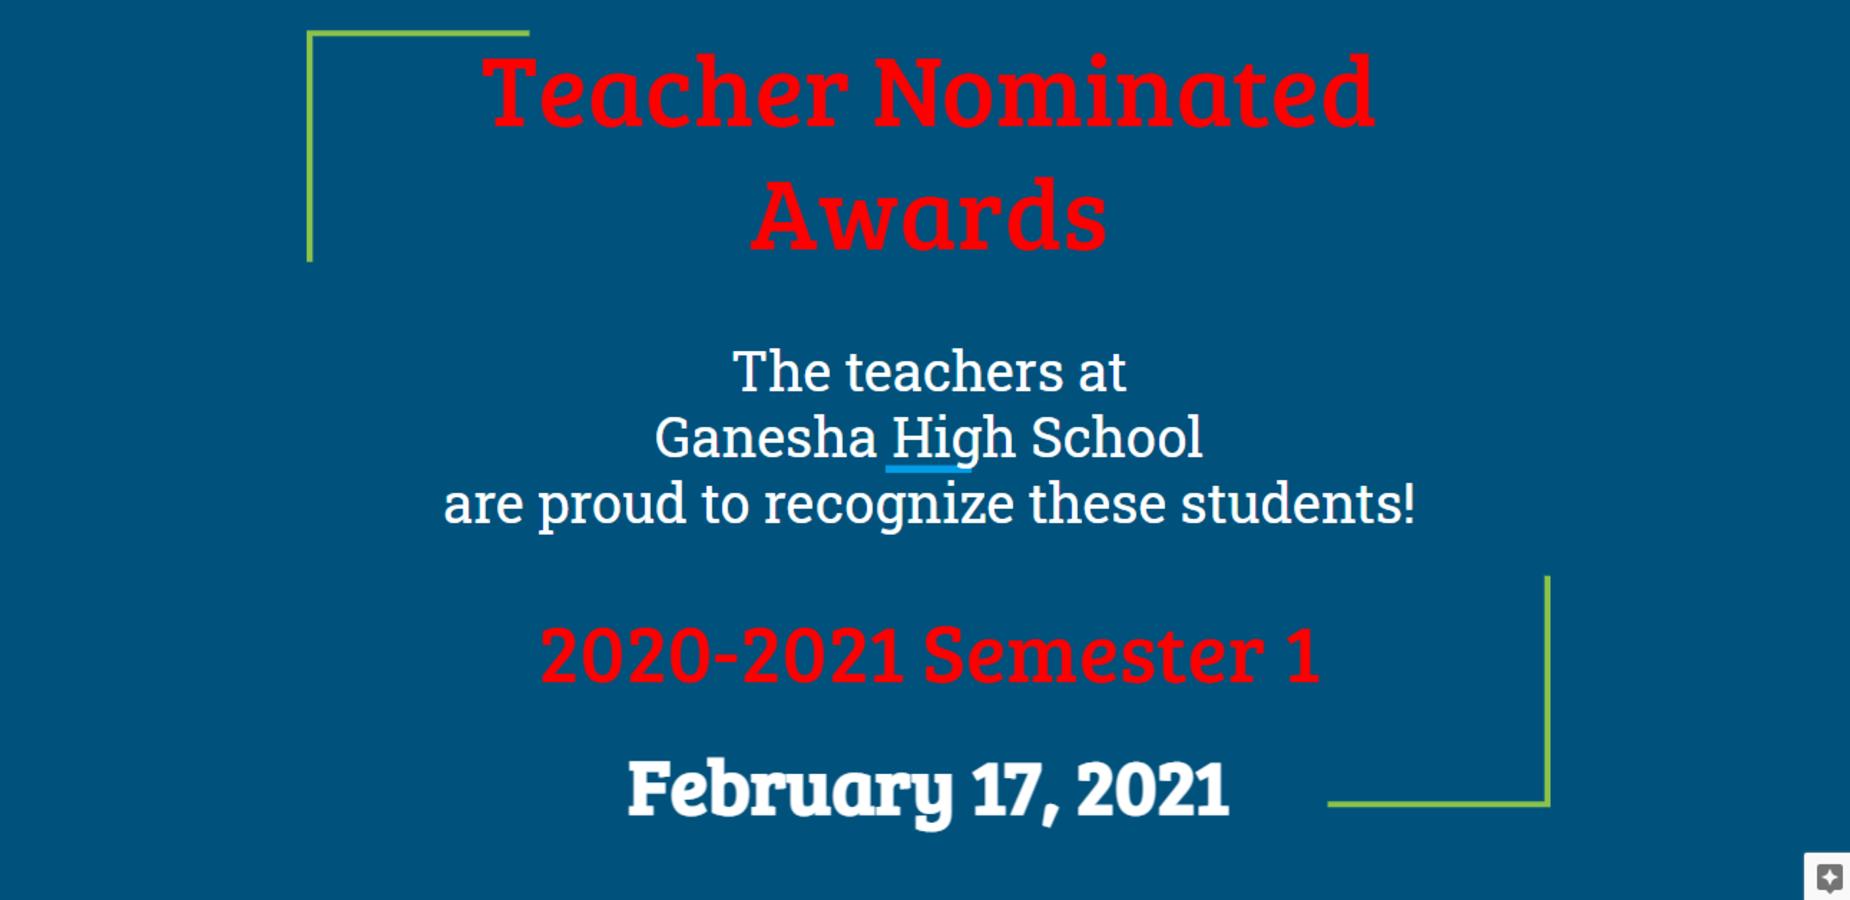 Teacher Nominated Awards